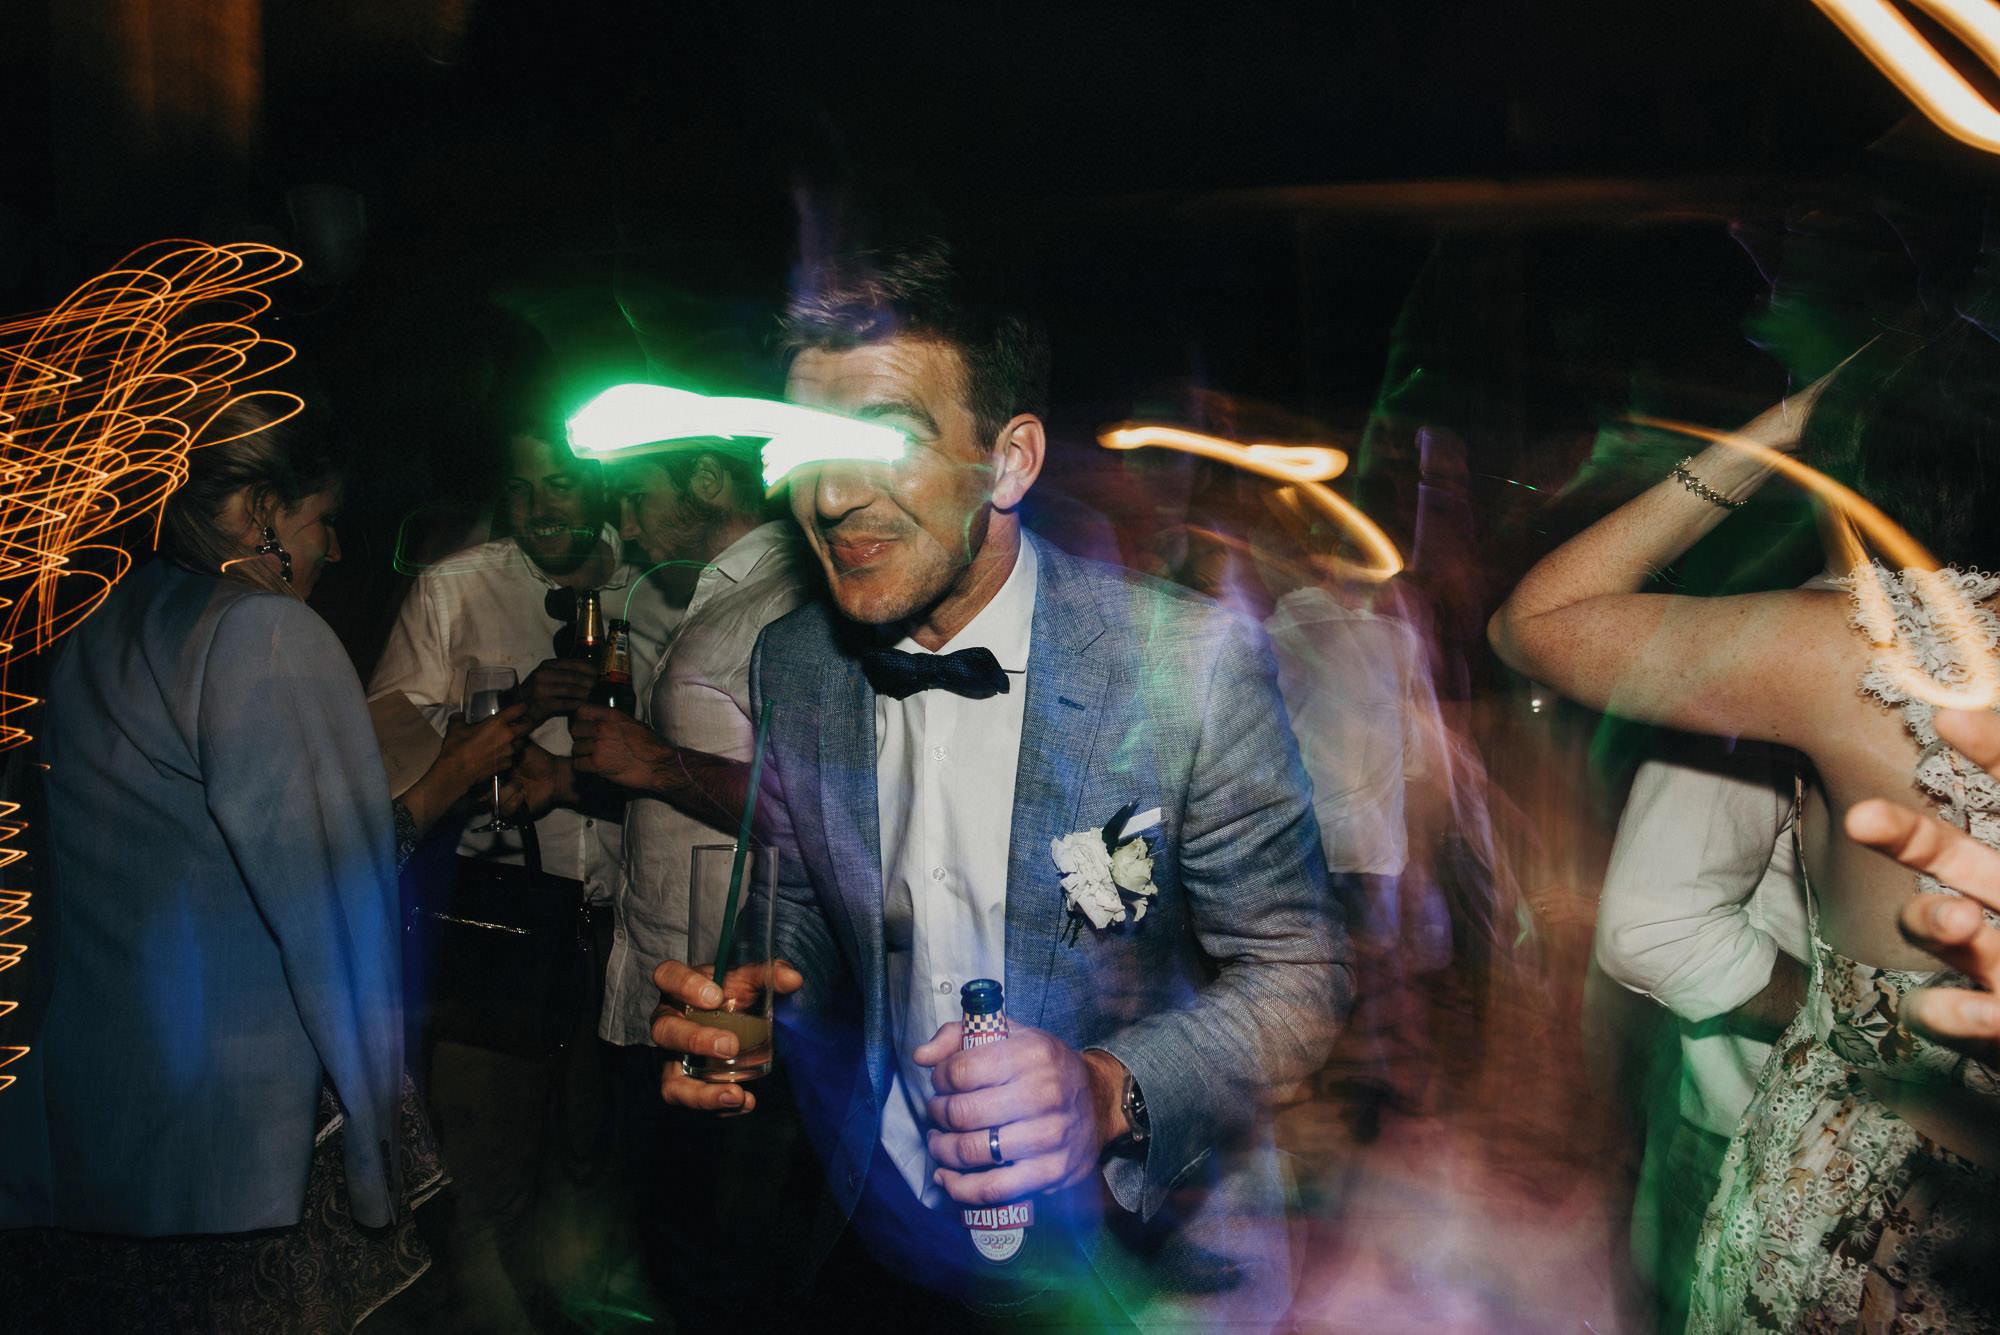 dubrovnik_croatia_wedding_photographer-jere_satamo-destination_weddings-094-web.jpg